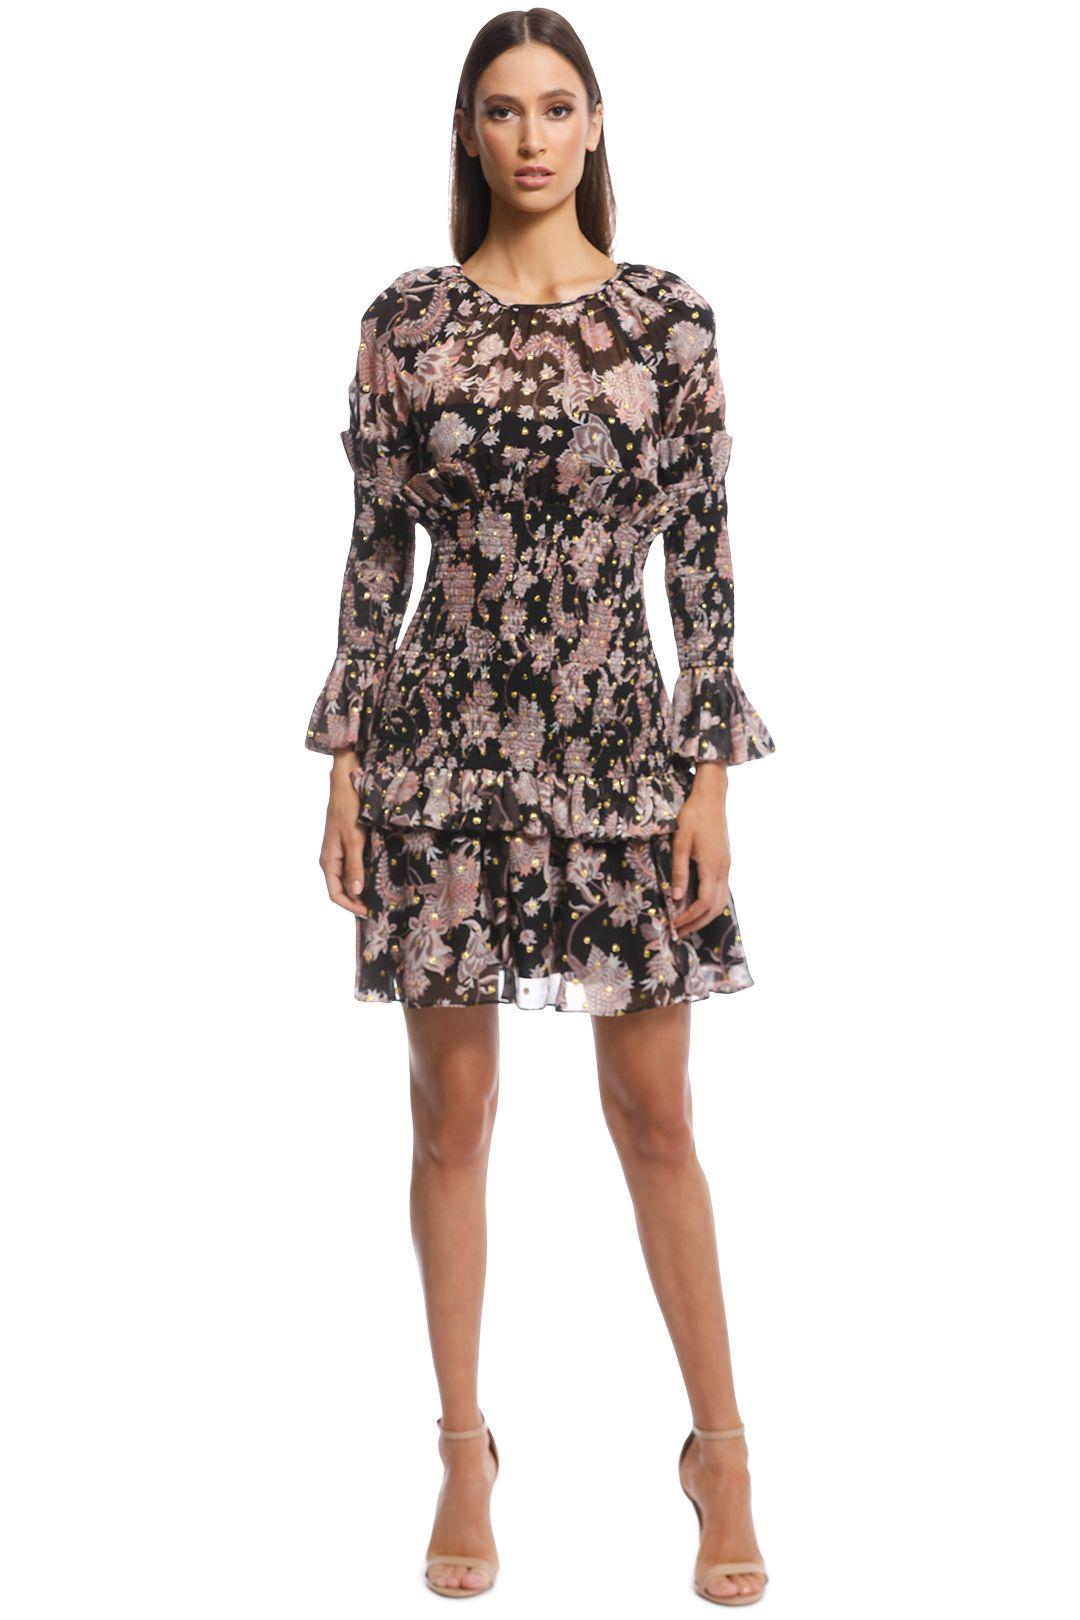 Thurley - Island Song Mini Print Dress - Black Multi - Front